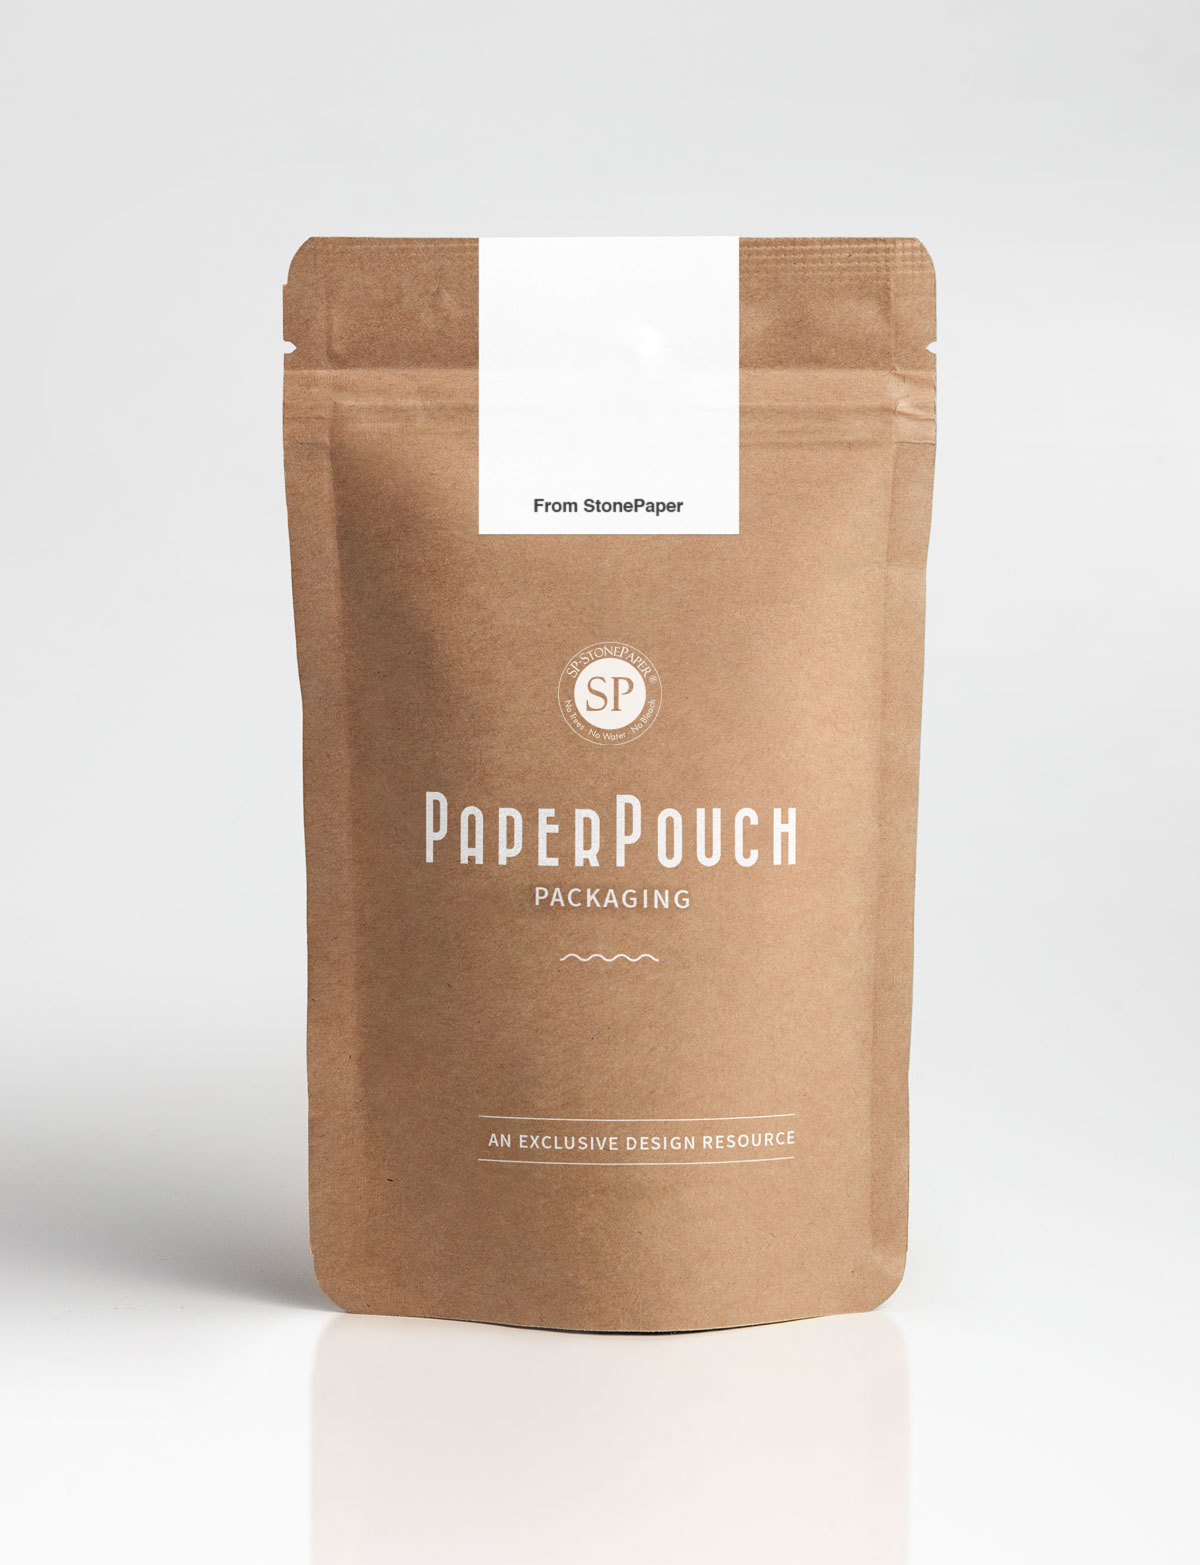 SP-StonePaper®  pouch